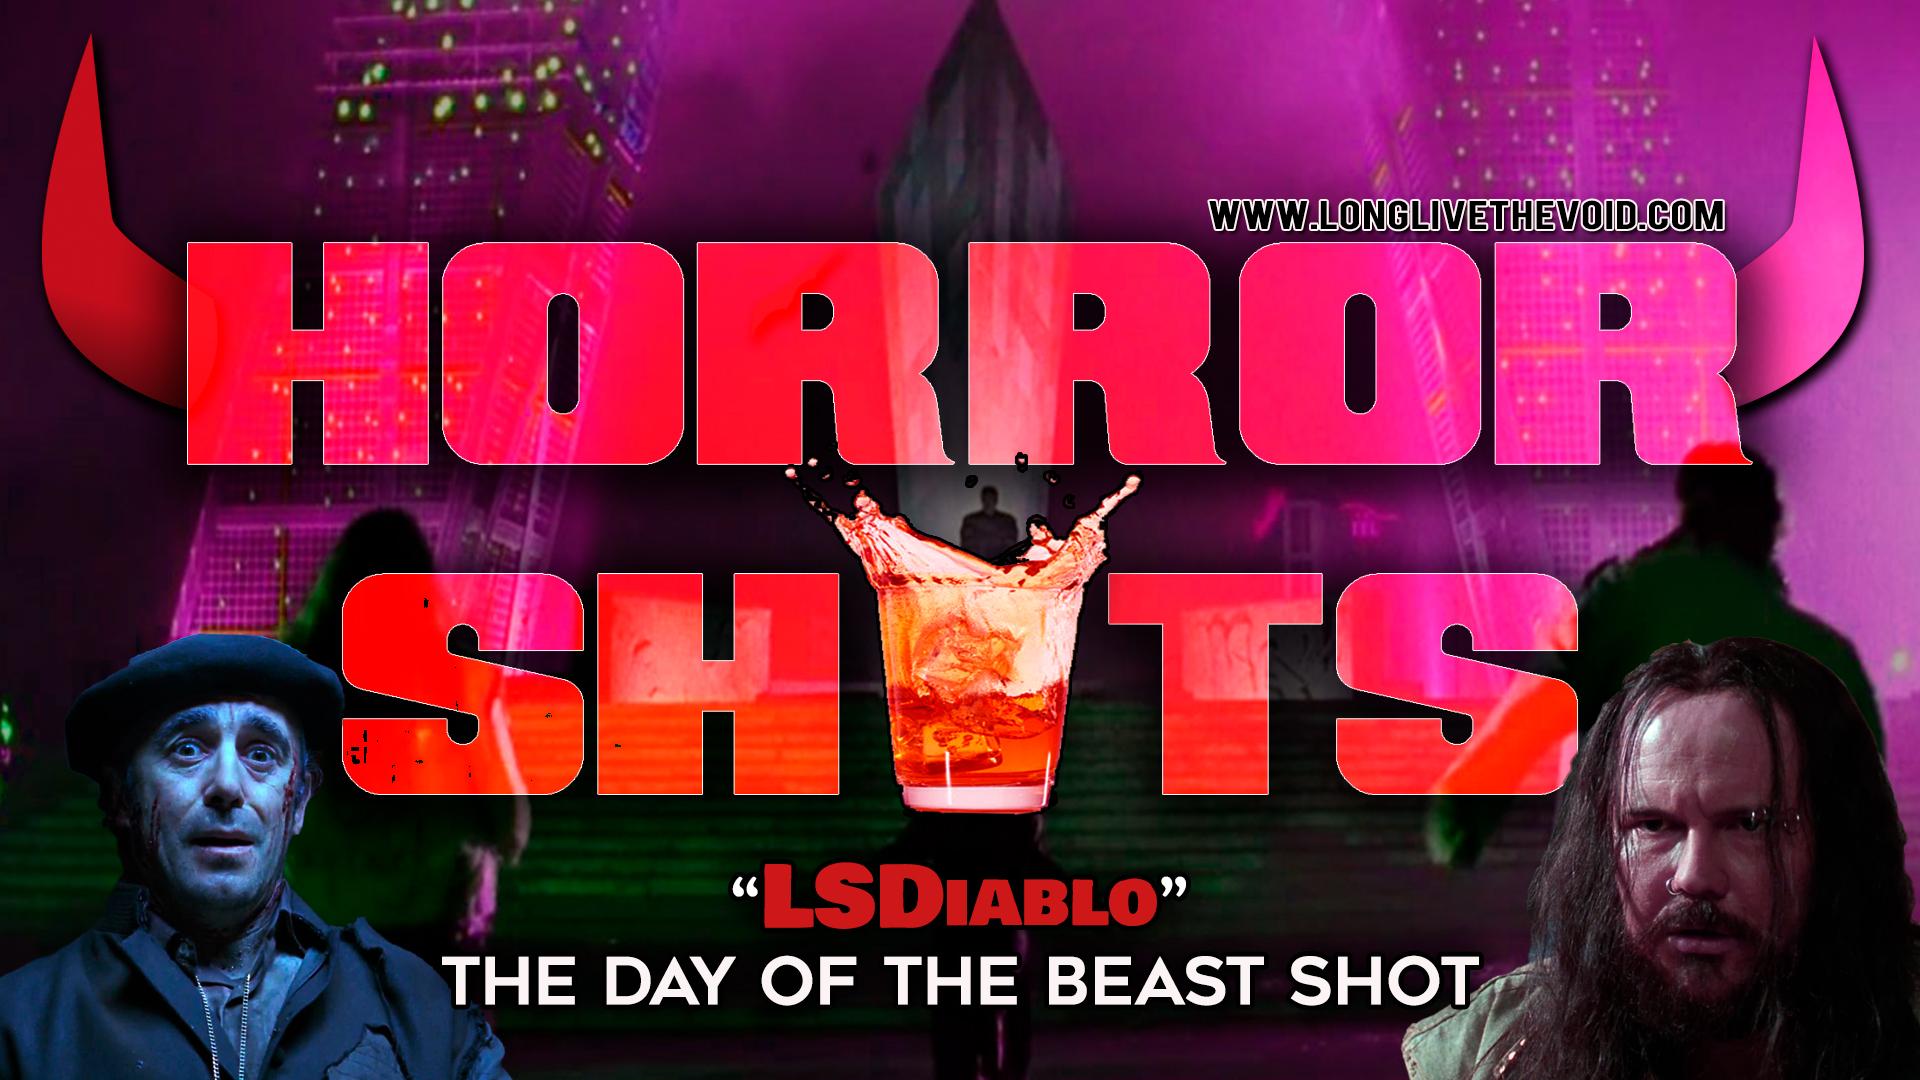 LSDiablo-Shot-Recipe-The-Day-of-the-beast.jpg